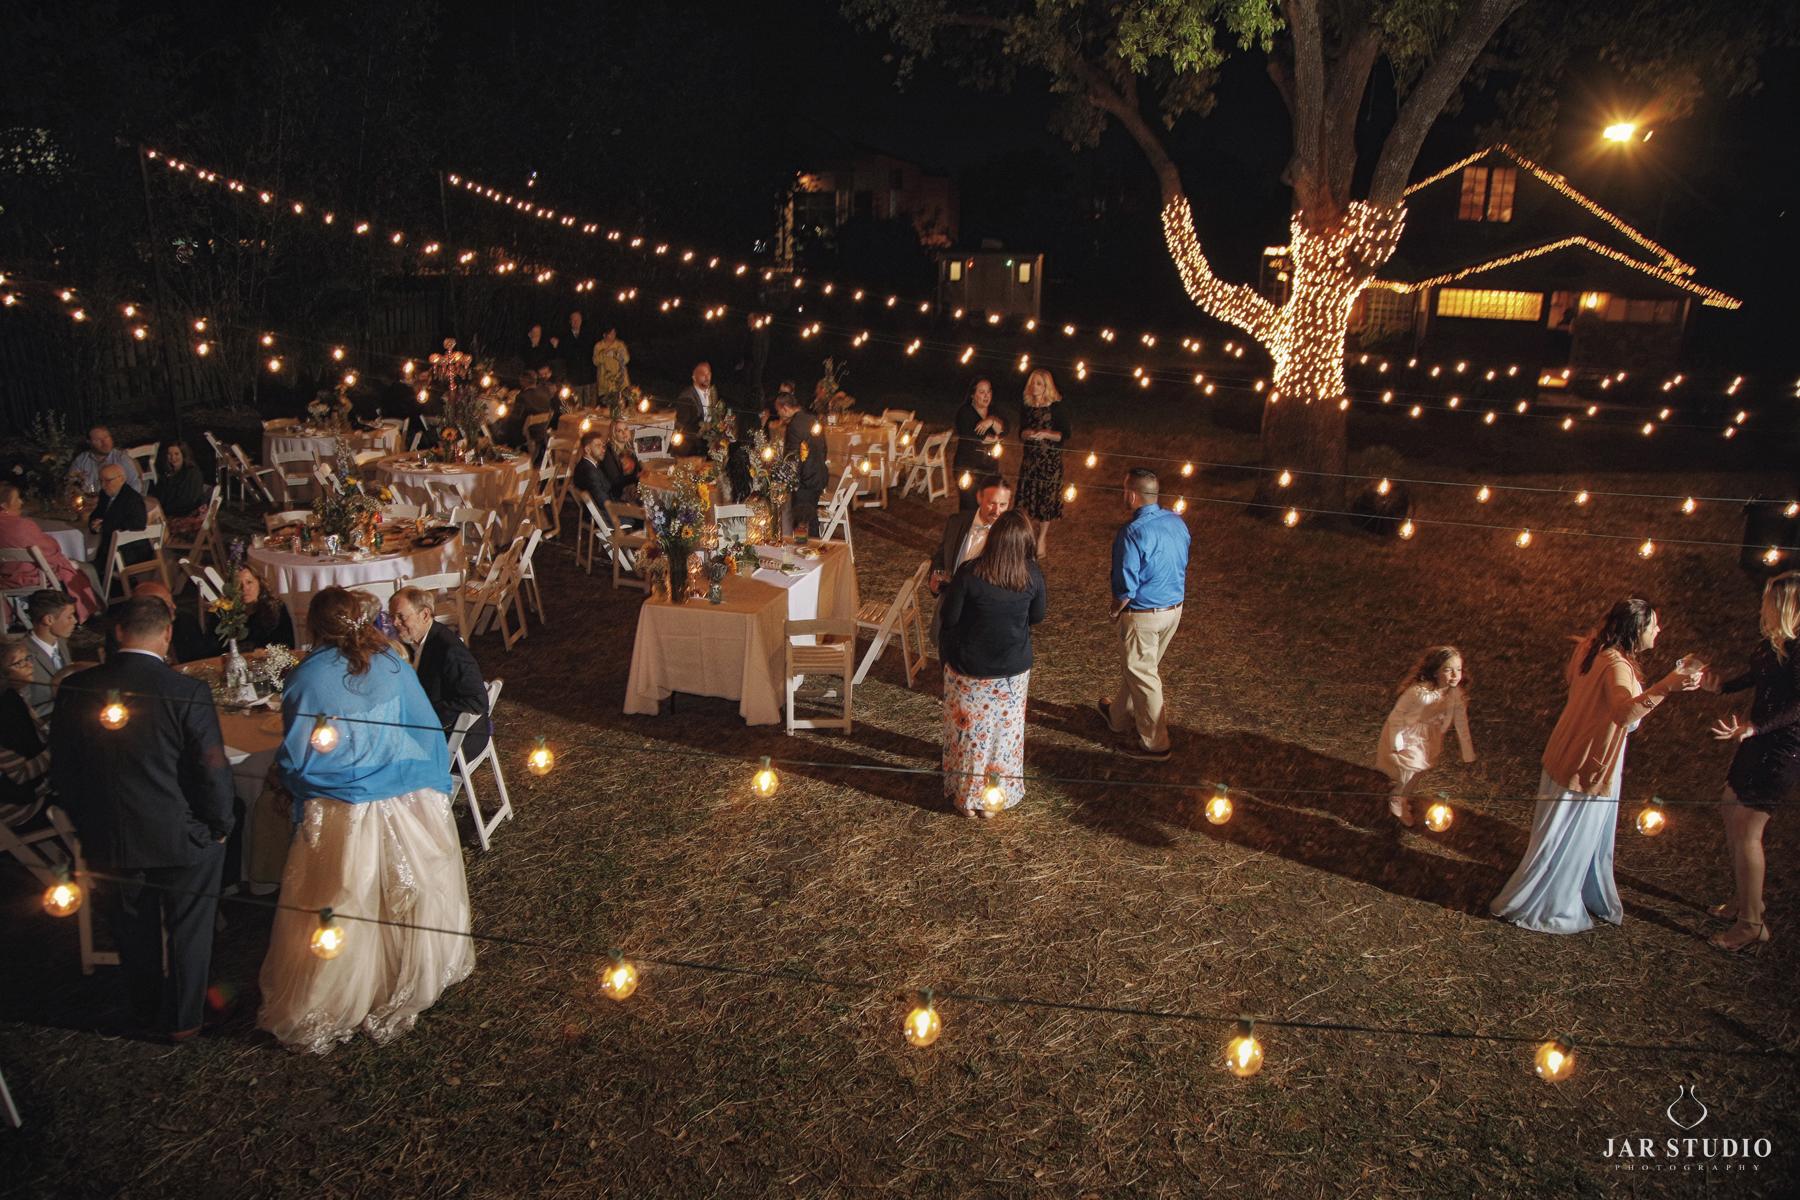 36-the-acre-real-wedding-reception-jarstudio.JPG